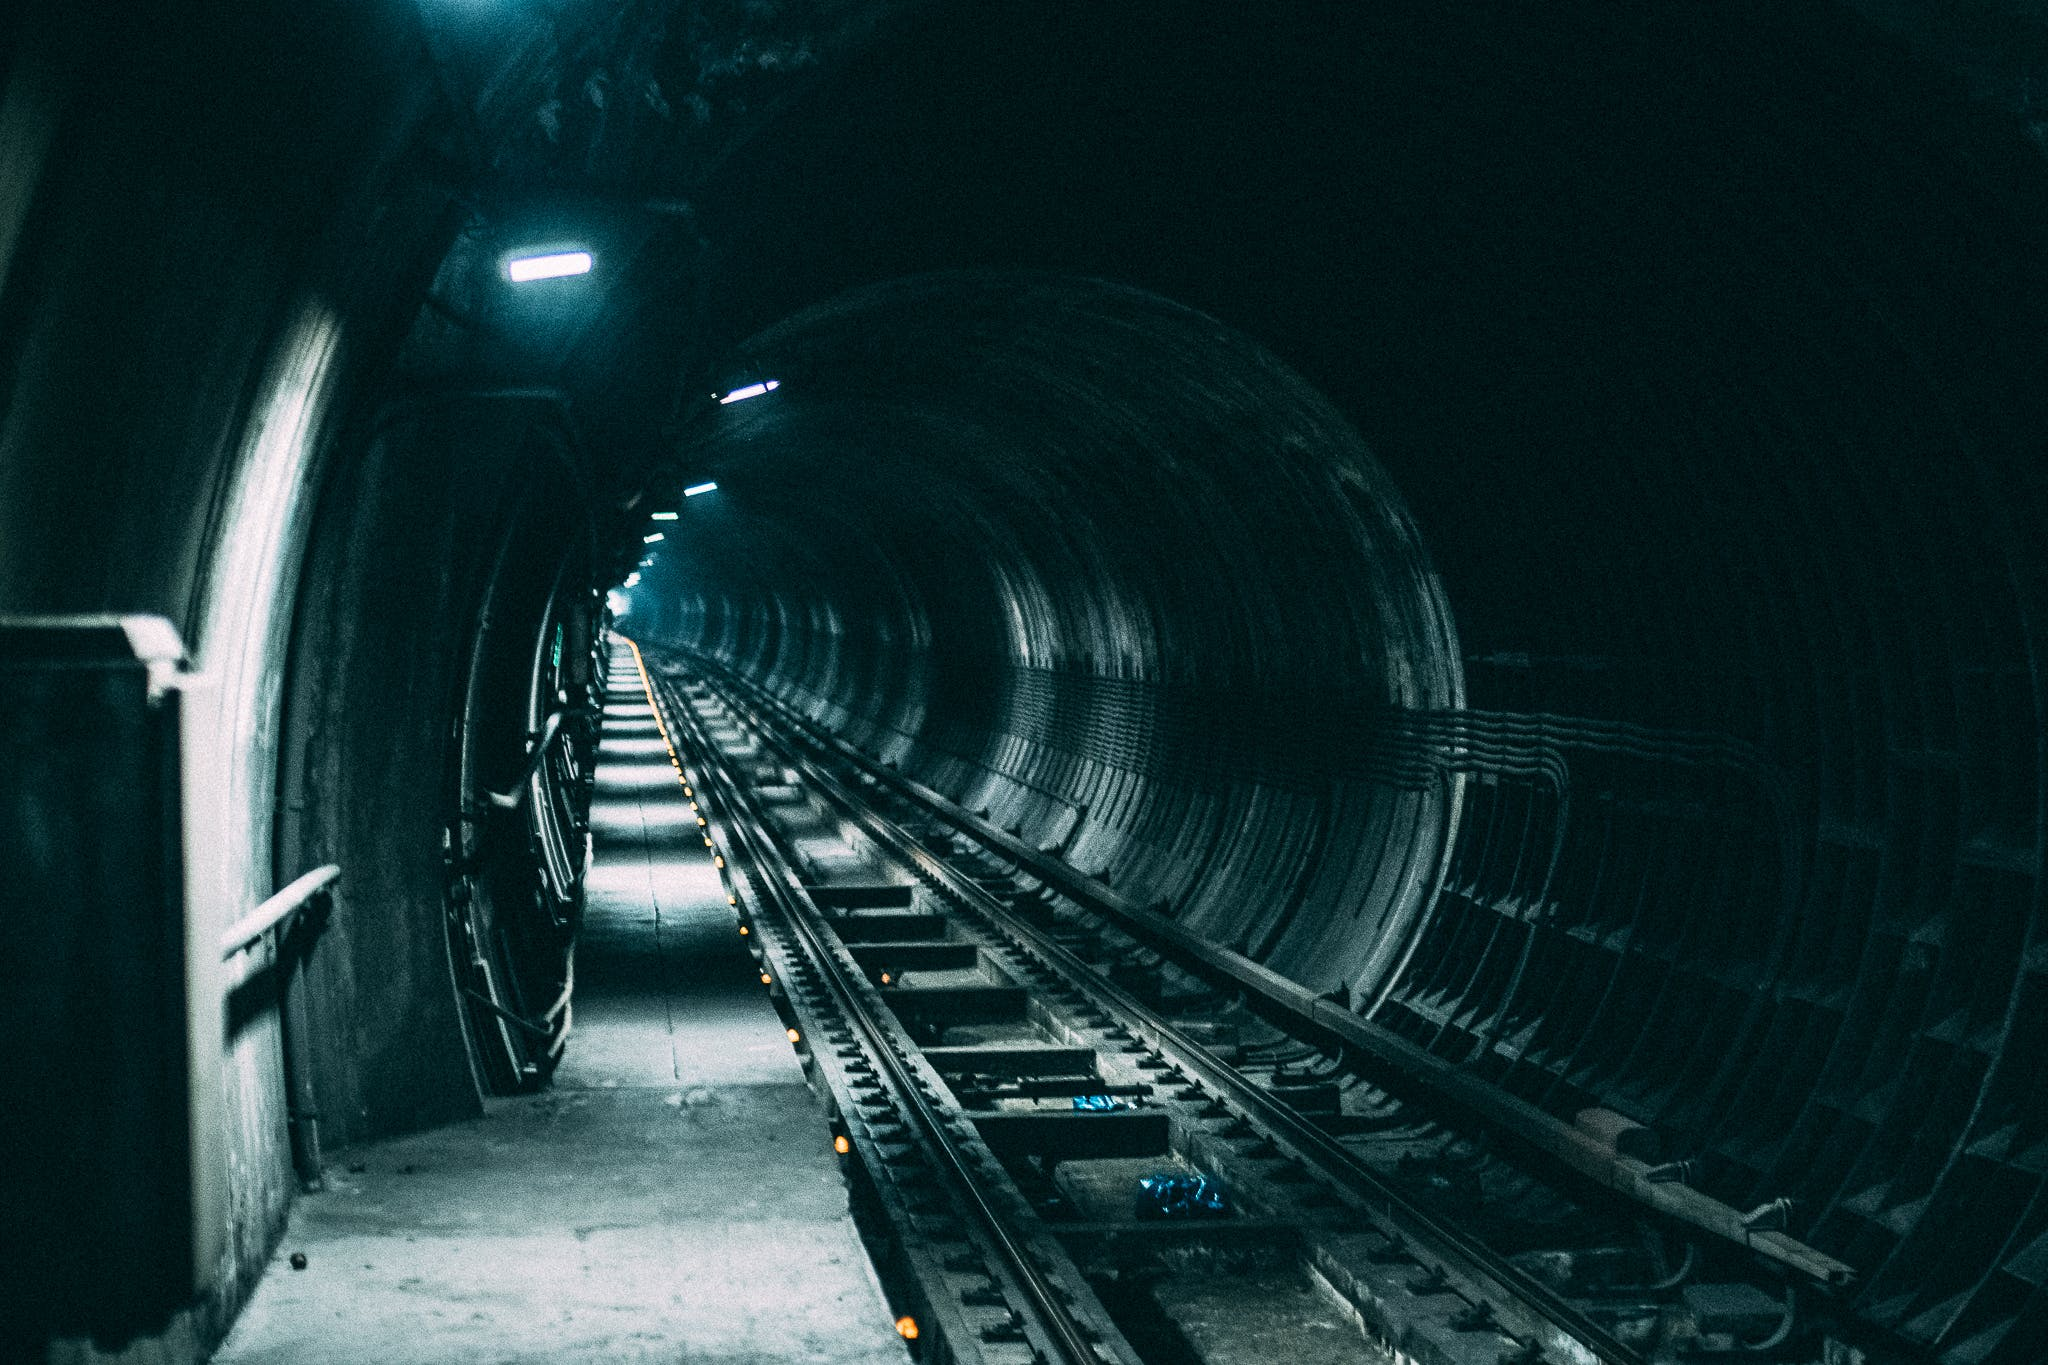 Empty Train Rail With Light